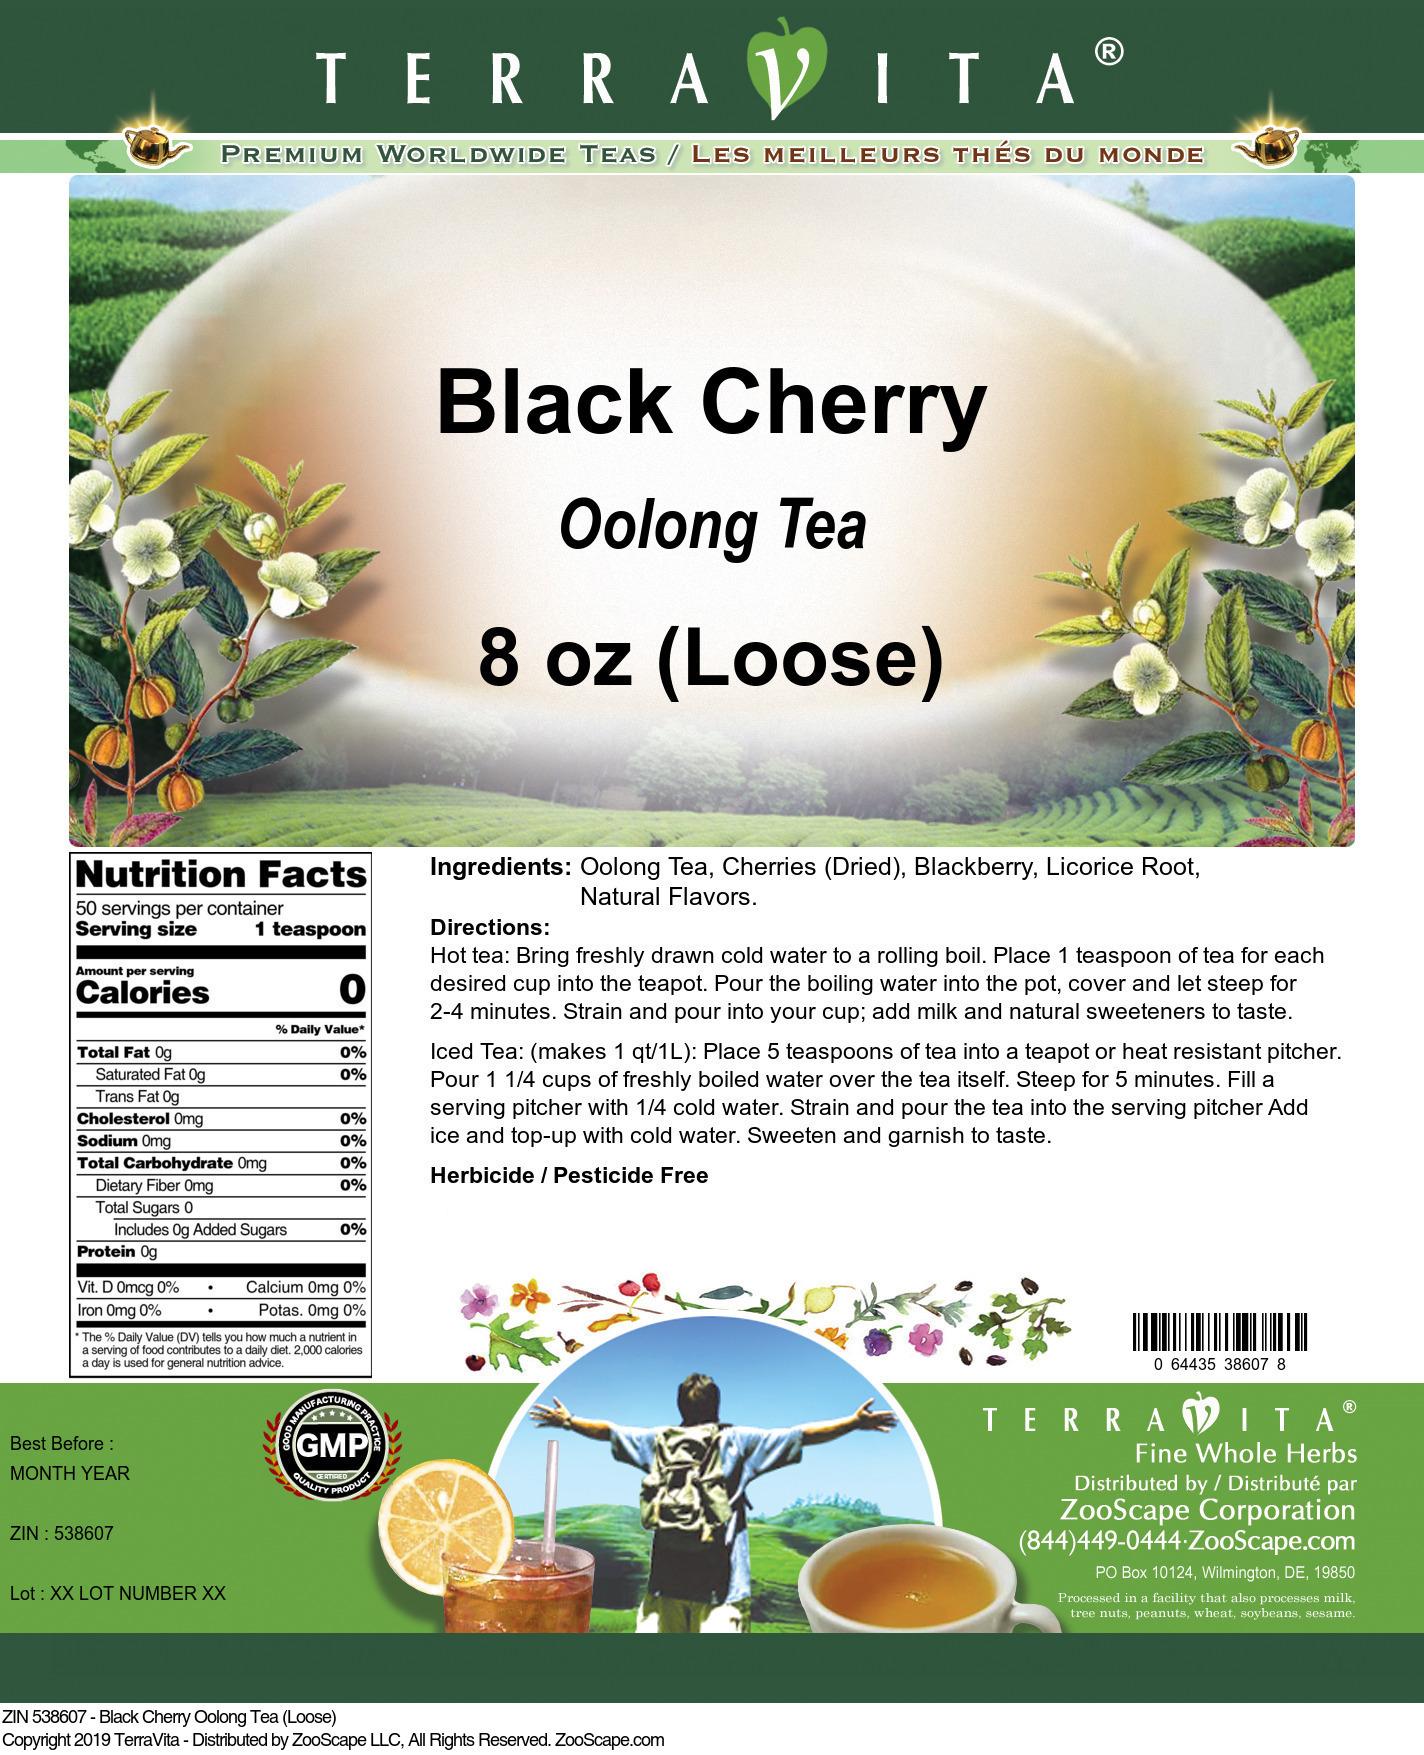 Black Cherry Oolong Tea (Loose)